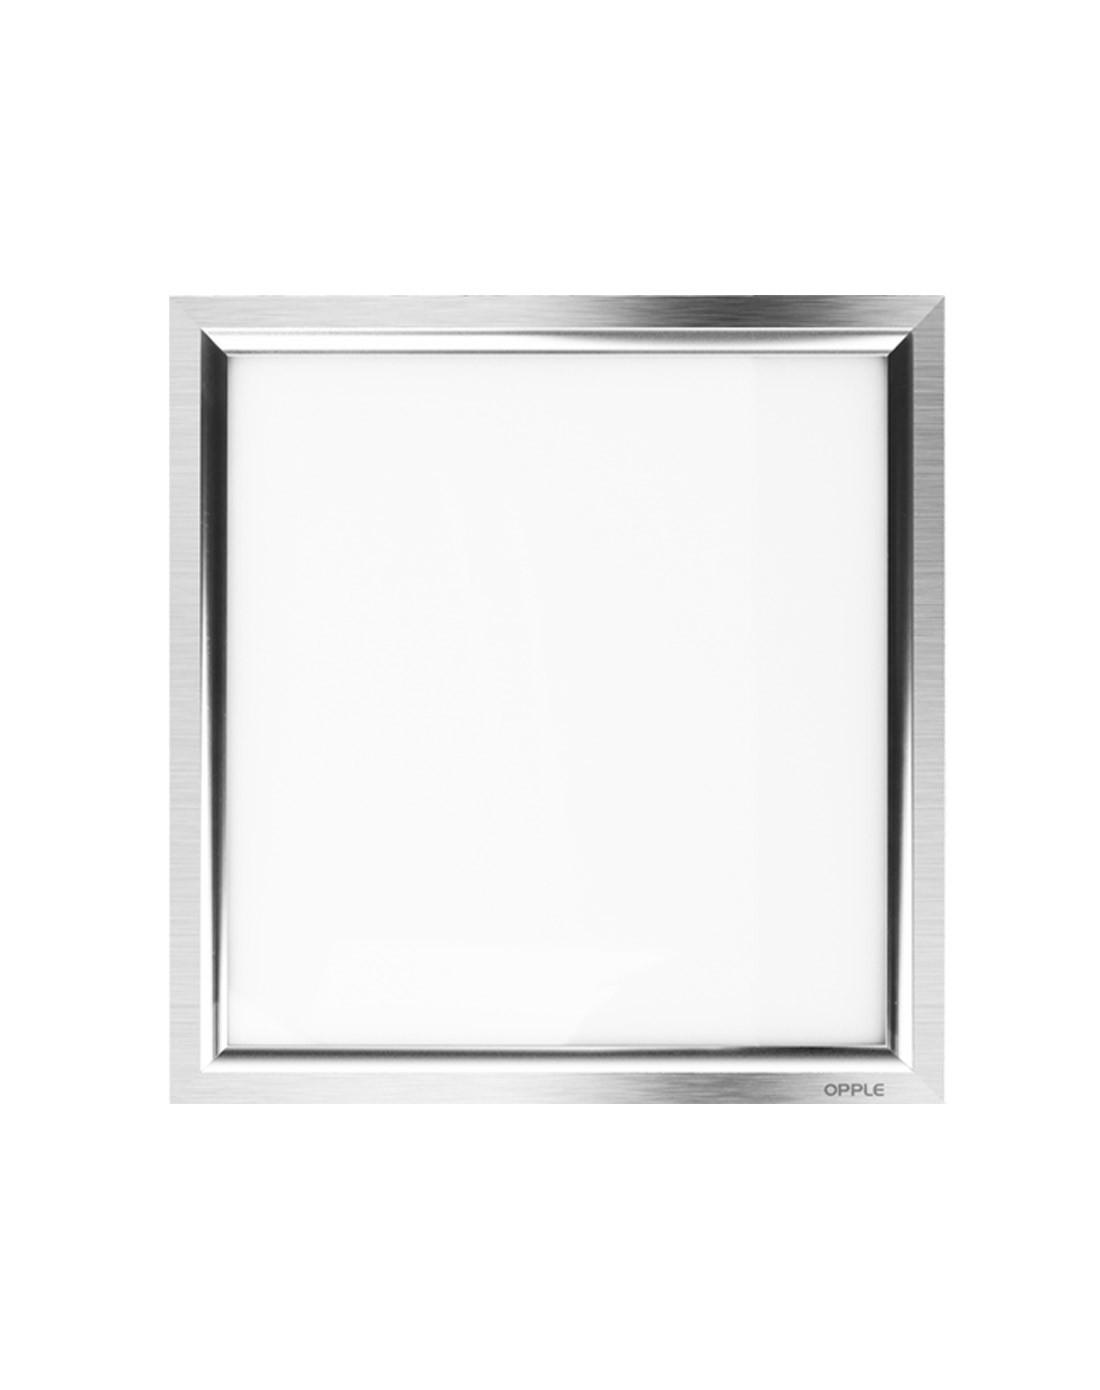 ppt 背景 背景图片 边框 模板 设计 矢量 矢量图 素材 相框 1100_1390